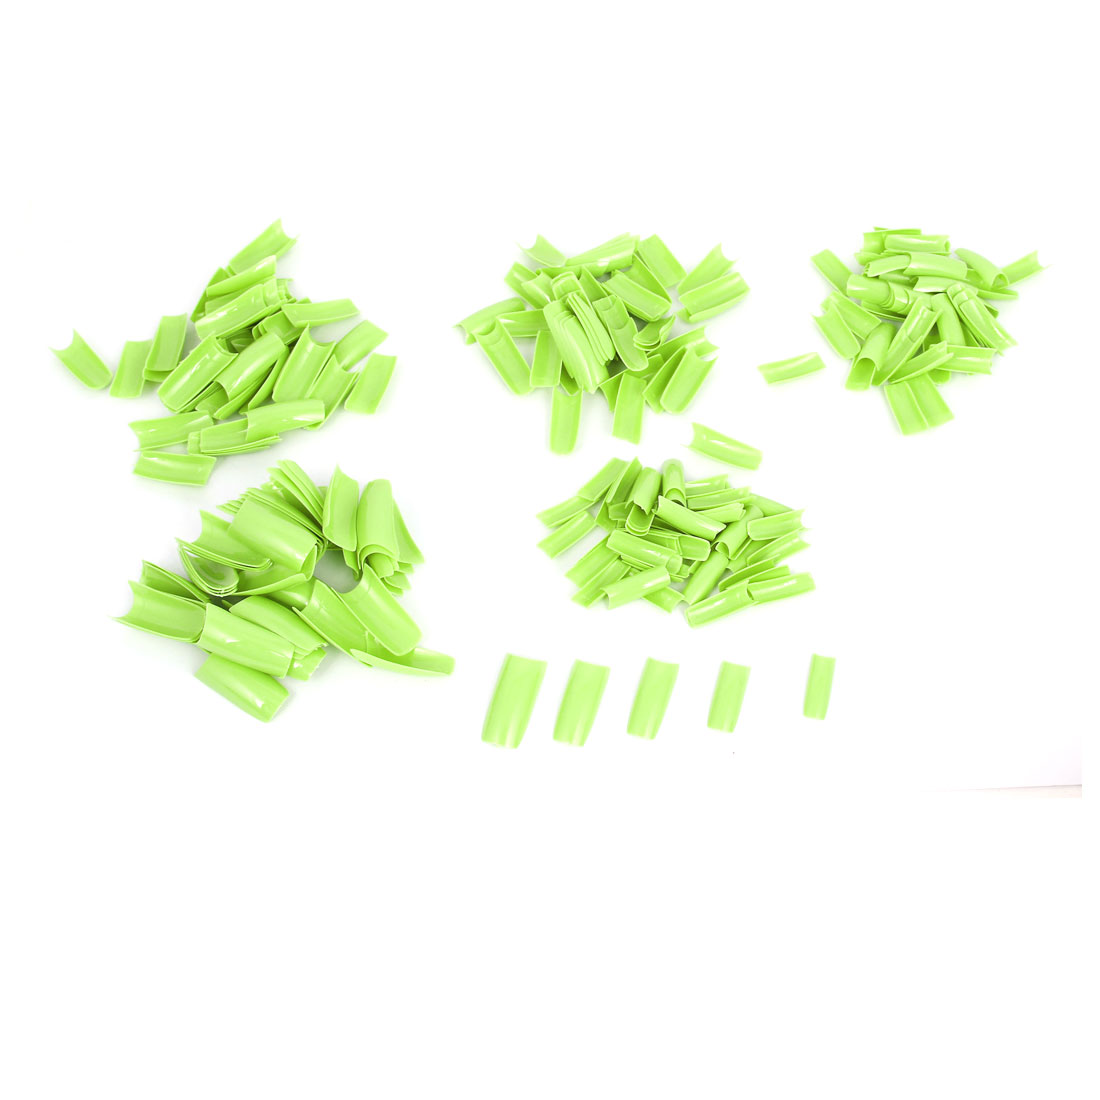 Lady Silver Green Plastic DIY False Nail Art Decal Stickers Tip Decor 250 Pcs